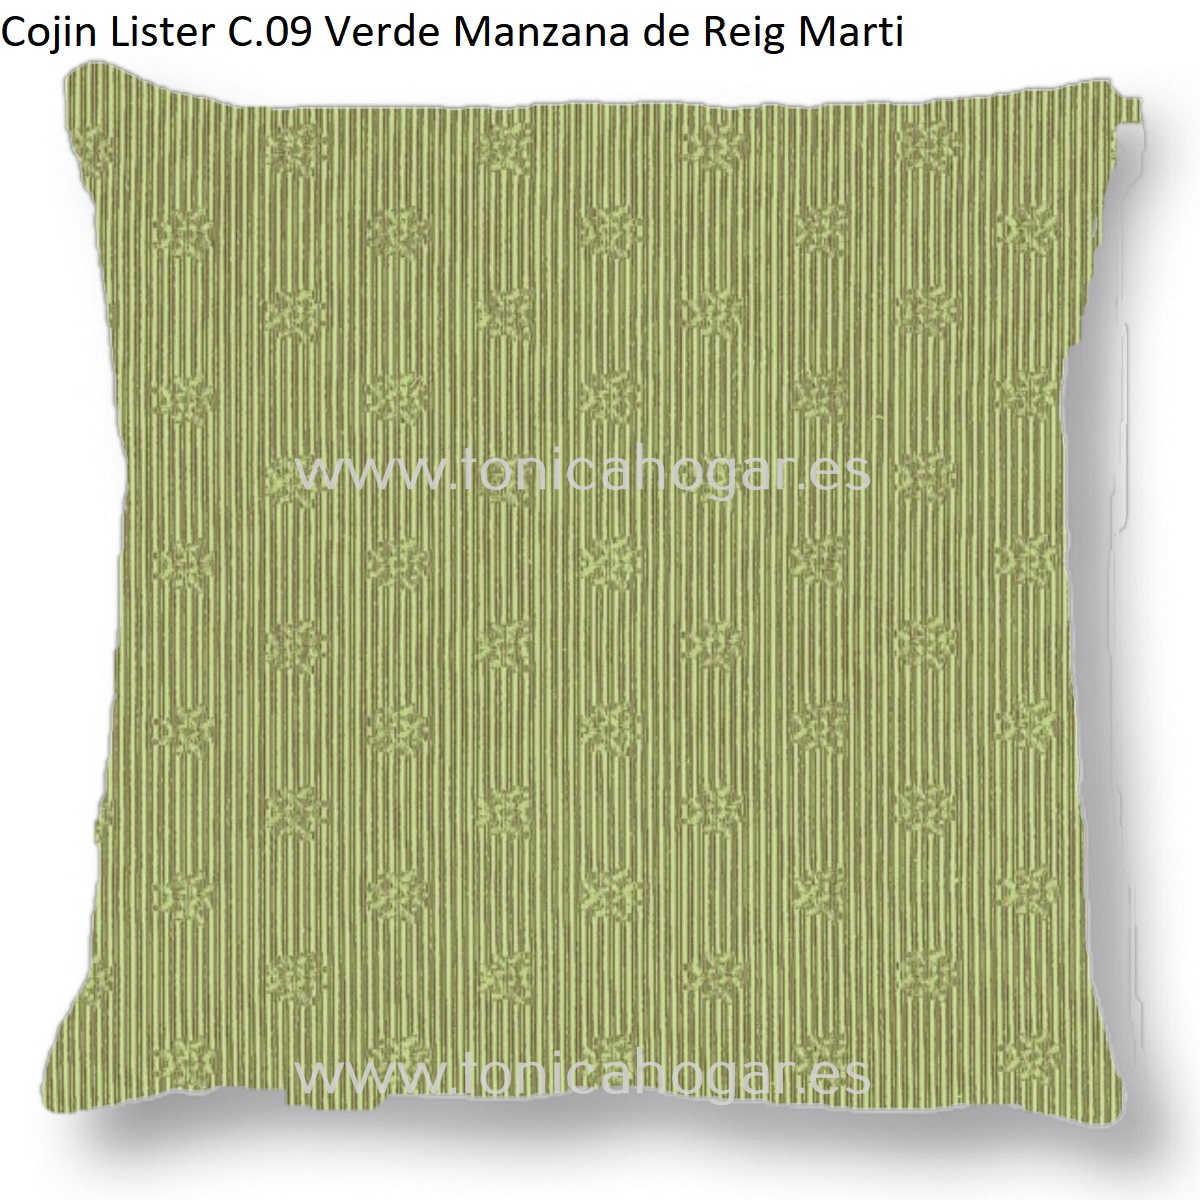 Cojín LISTER CT de Reig Marti Verde Manzana Cojín 55x55